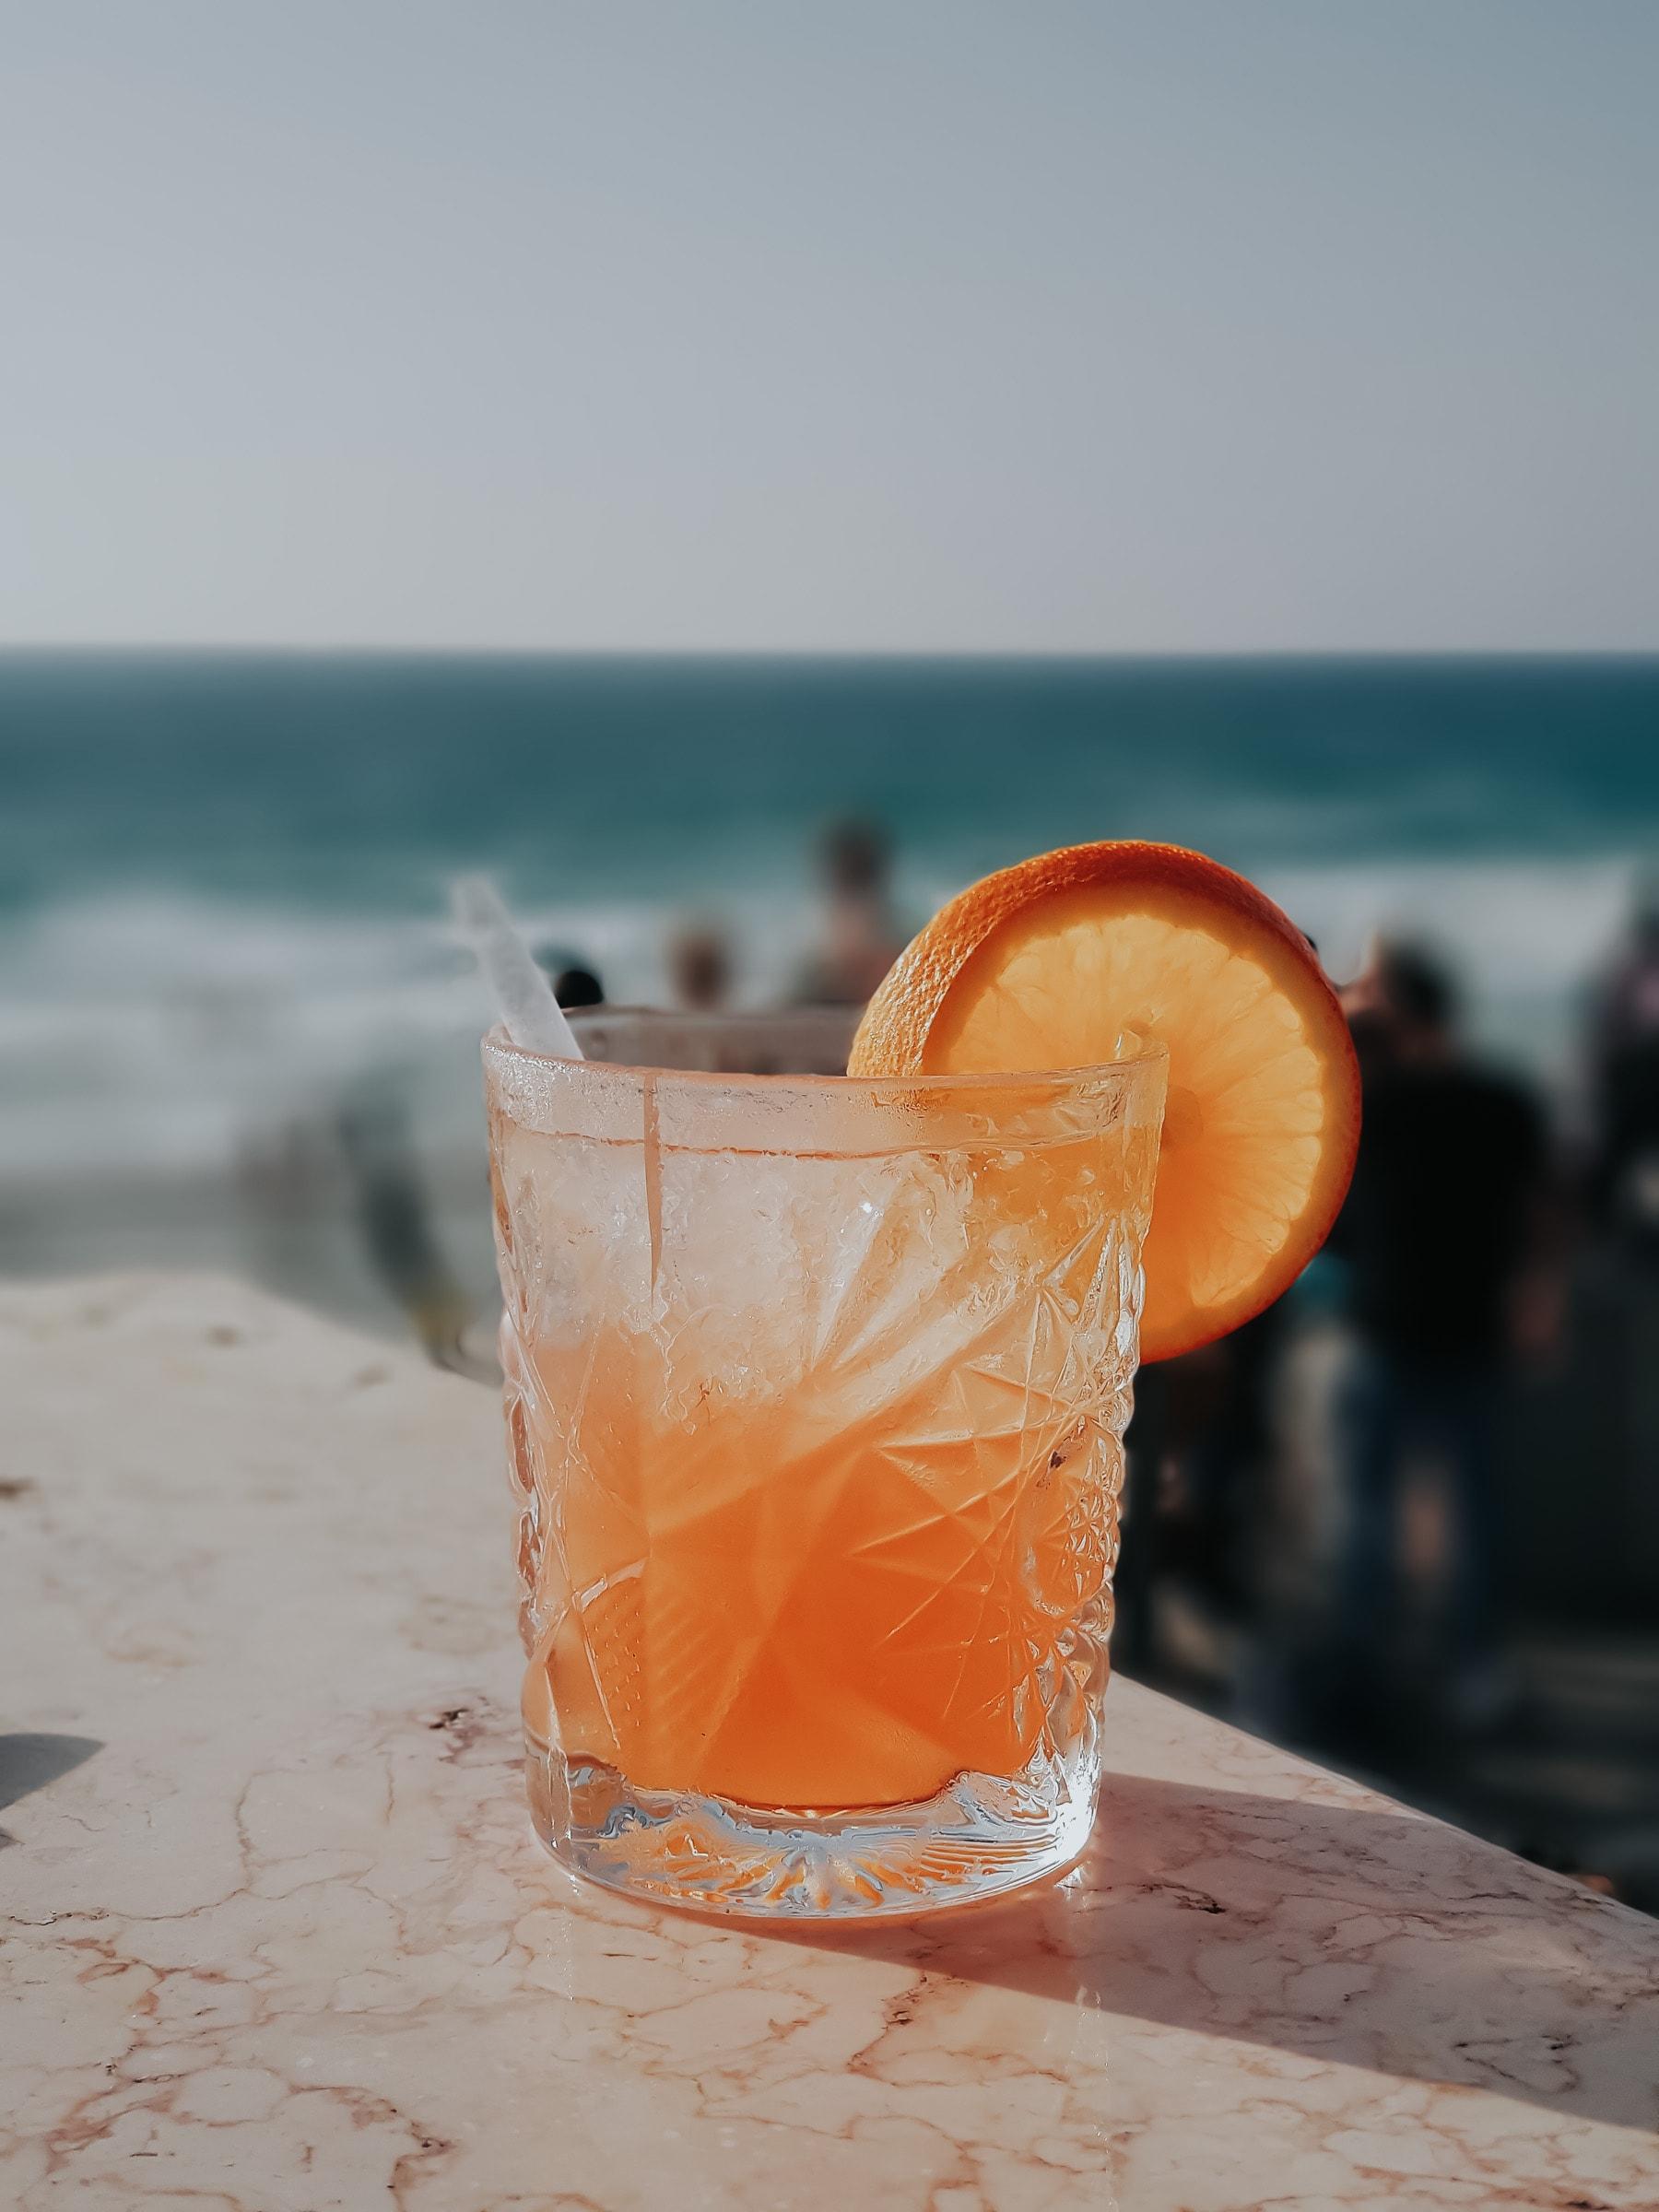 Tel Aviv Cocktail Bar am Strand Alma Beach